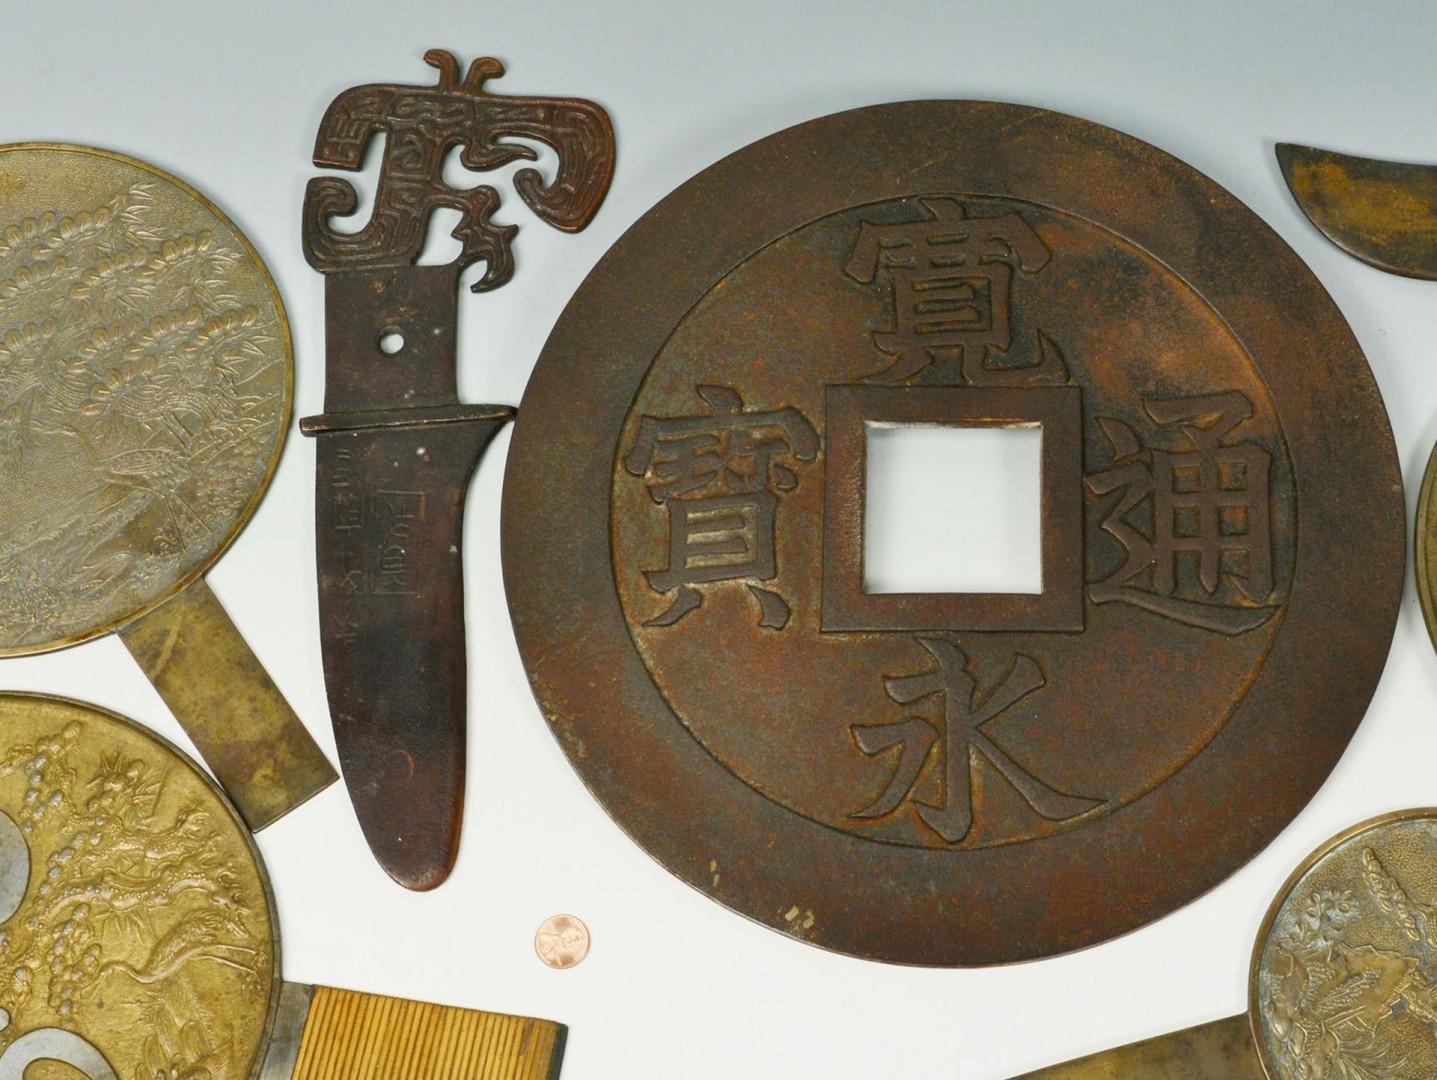 Lot 254: Chinese Metal Items, 7pcs. total